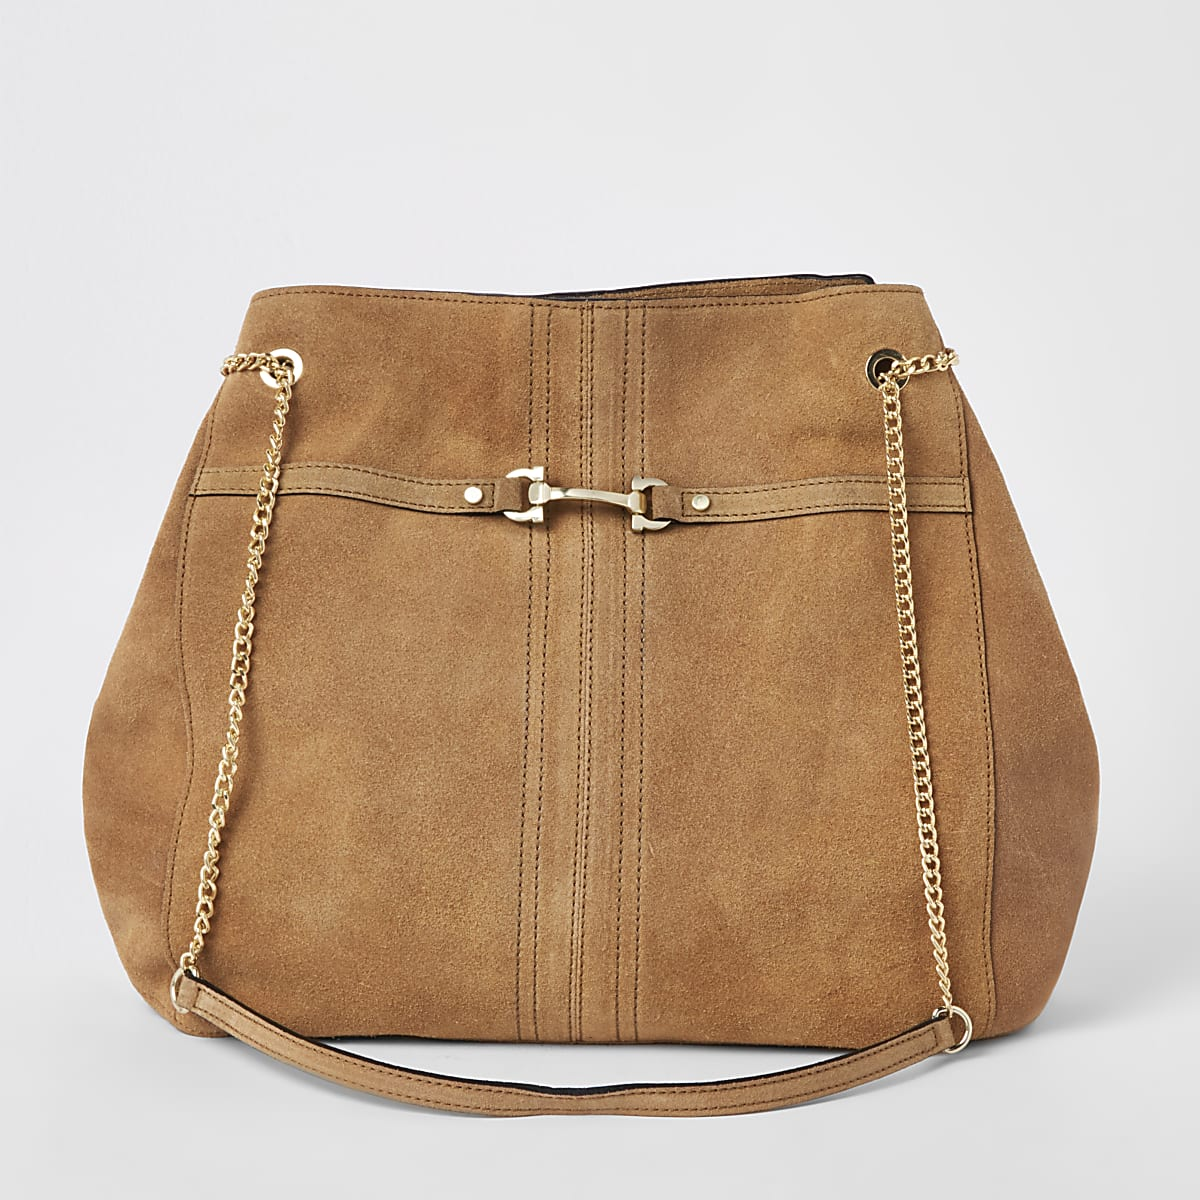 Dark beige suede leather snaffle slouch bag